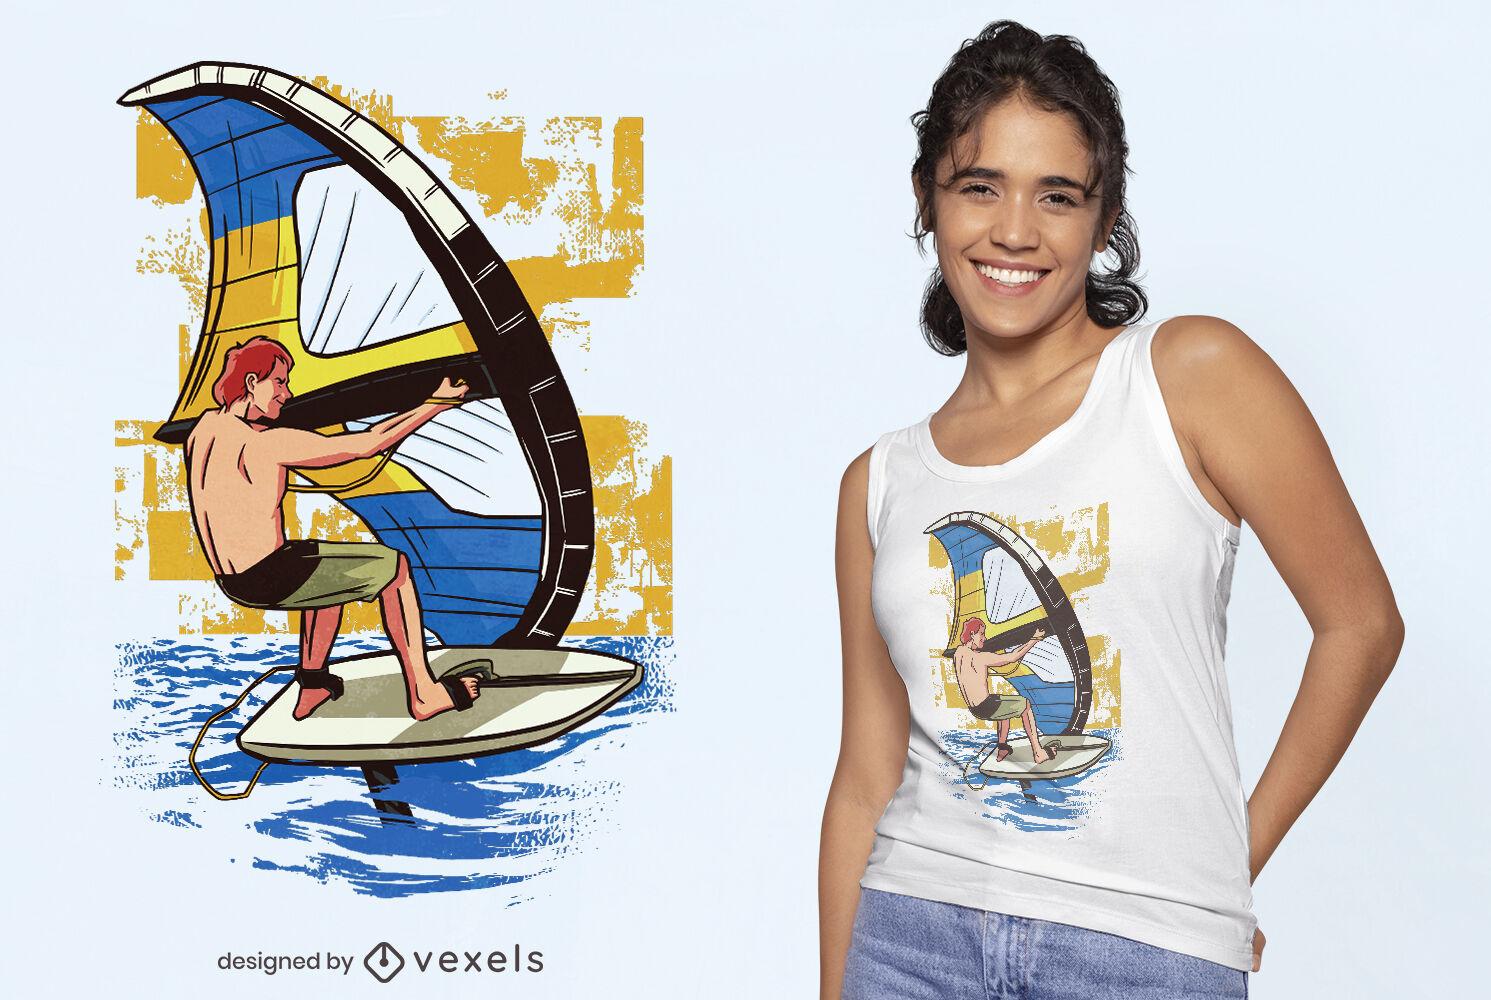 Wing surfing t-shirt design